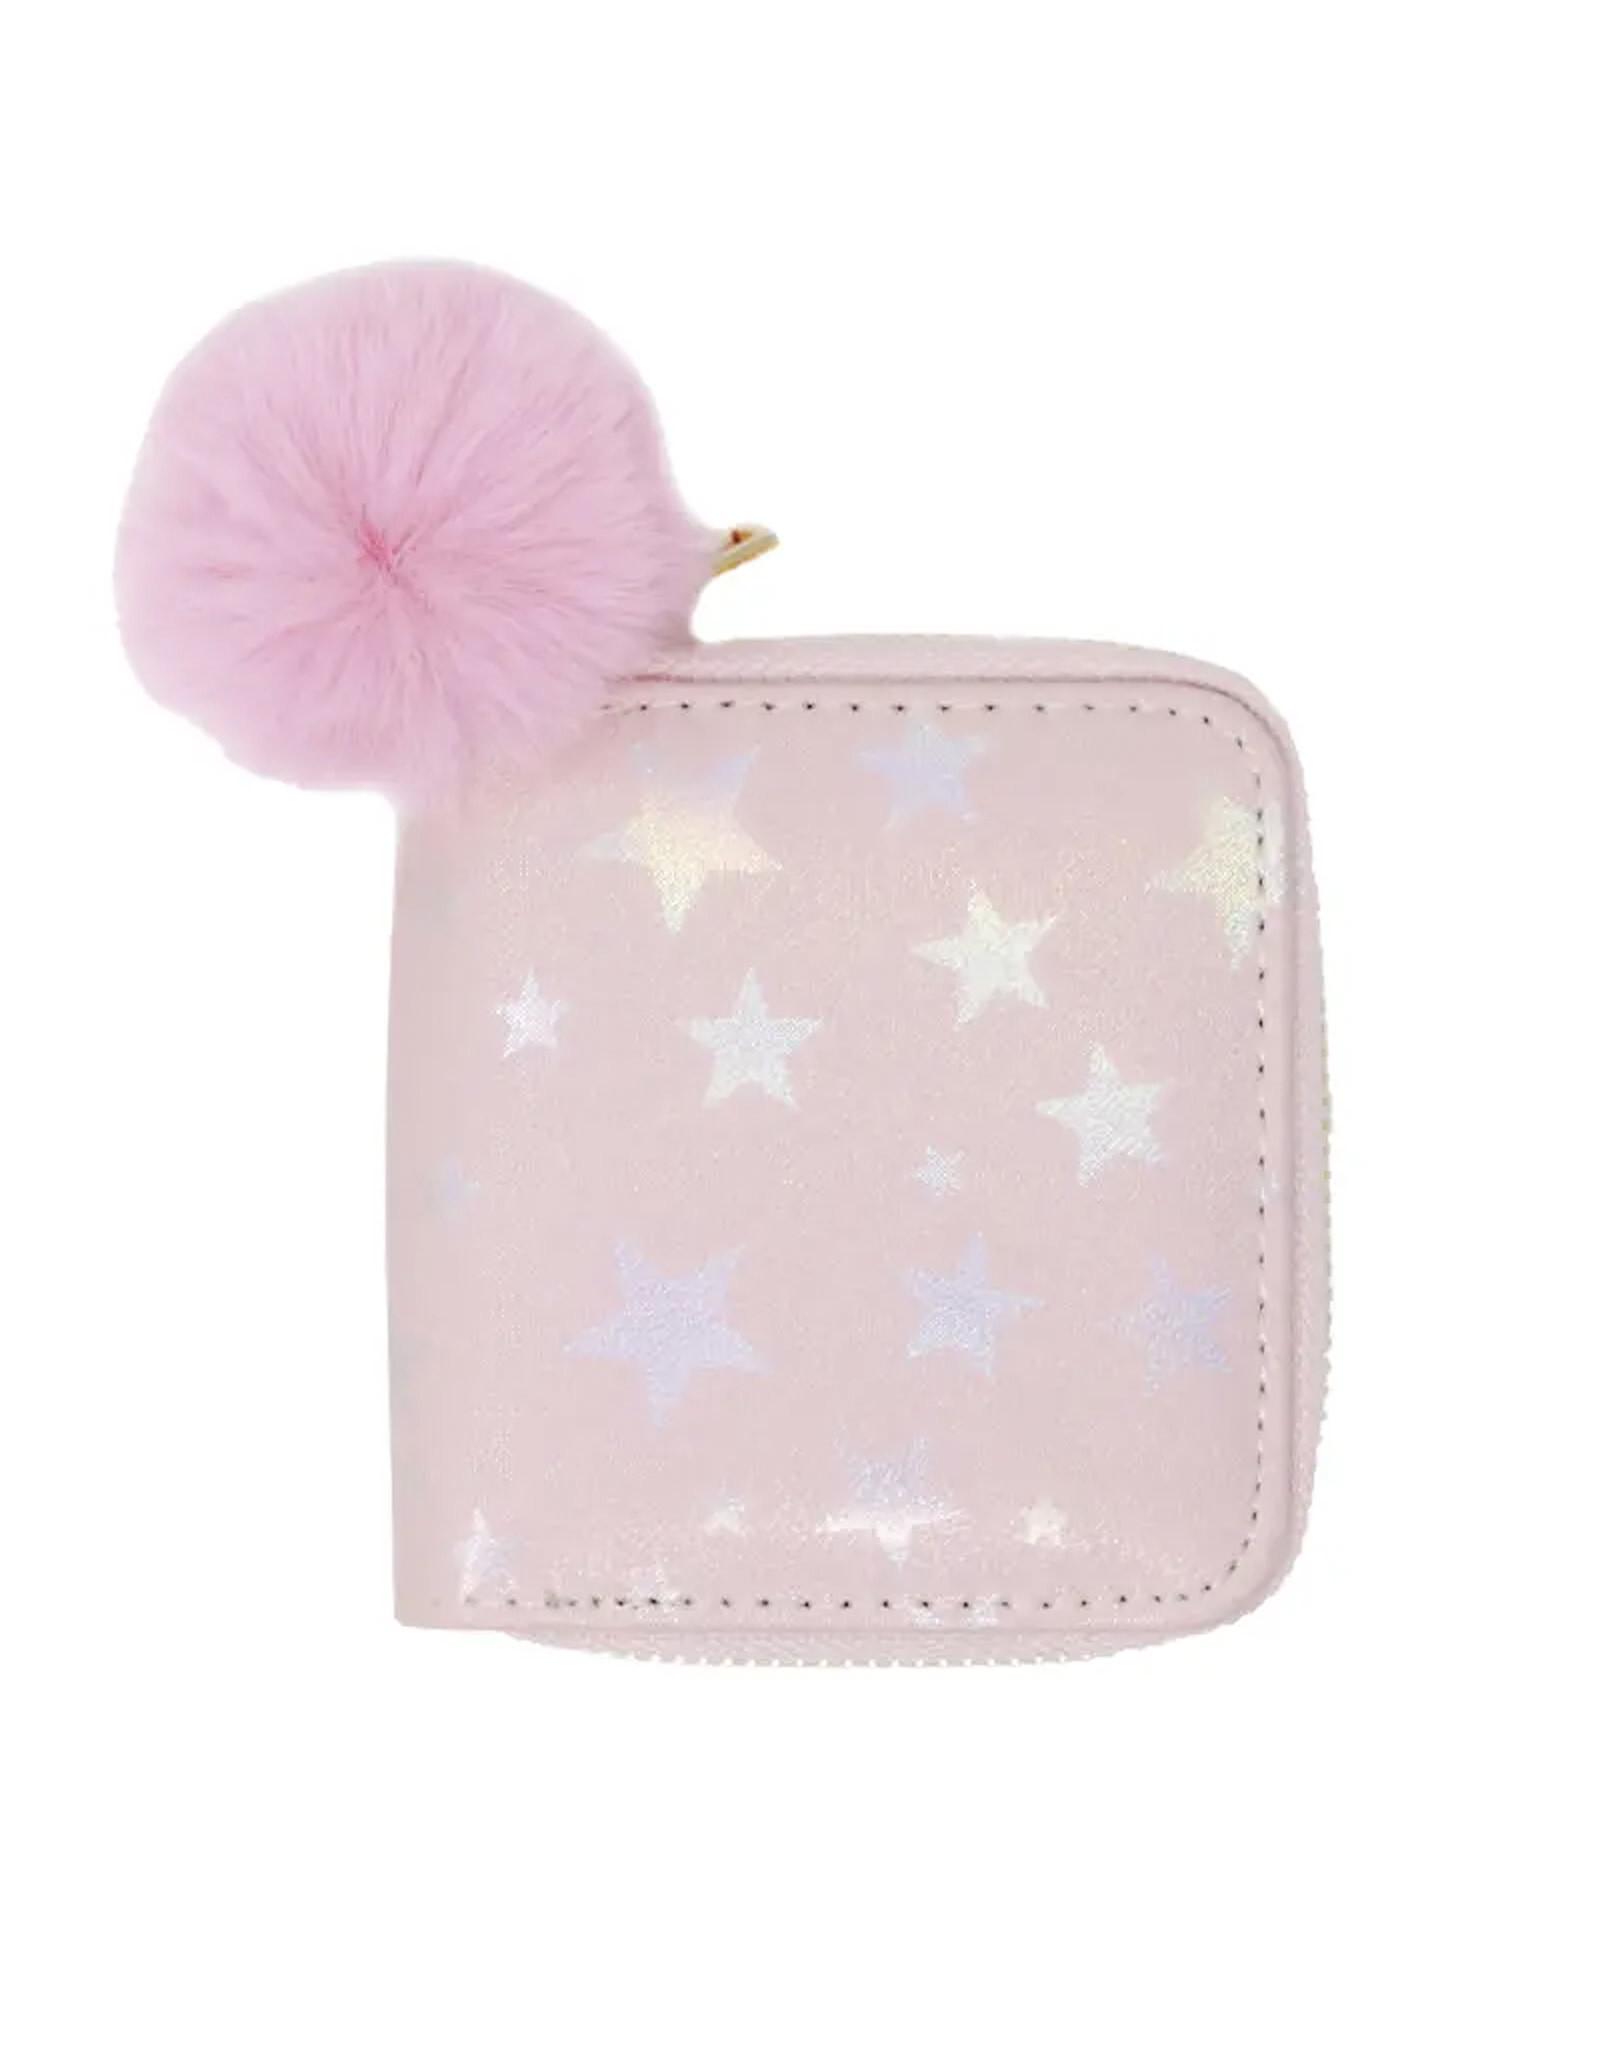 Tiny Treats & Zomi Gems Shiny Star Kids Wallet Pink